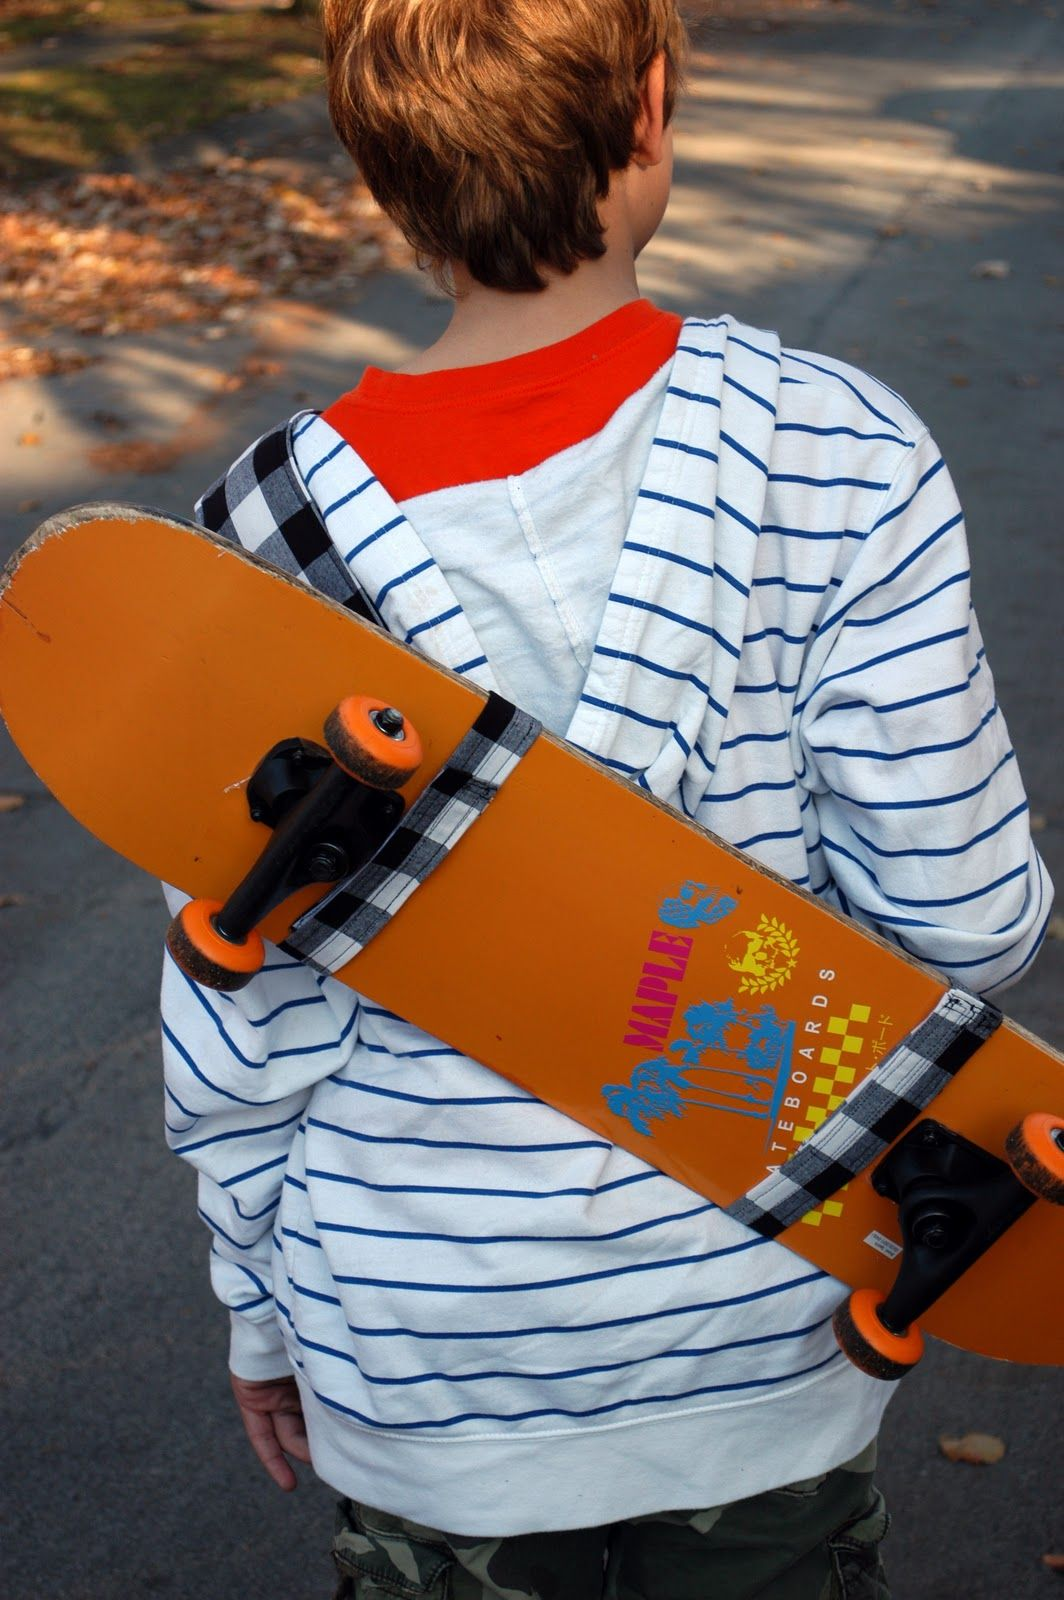 Gfg guest tutorial skateboard sling by the boy trifecta